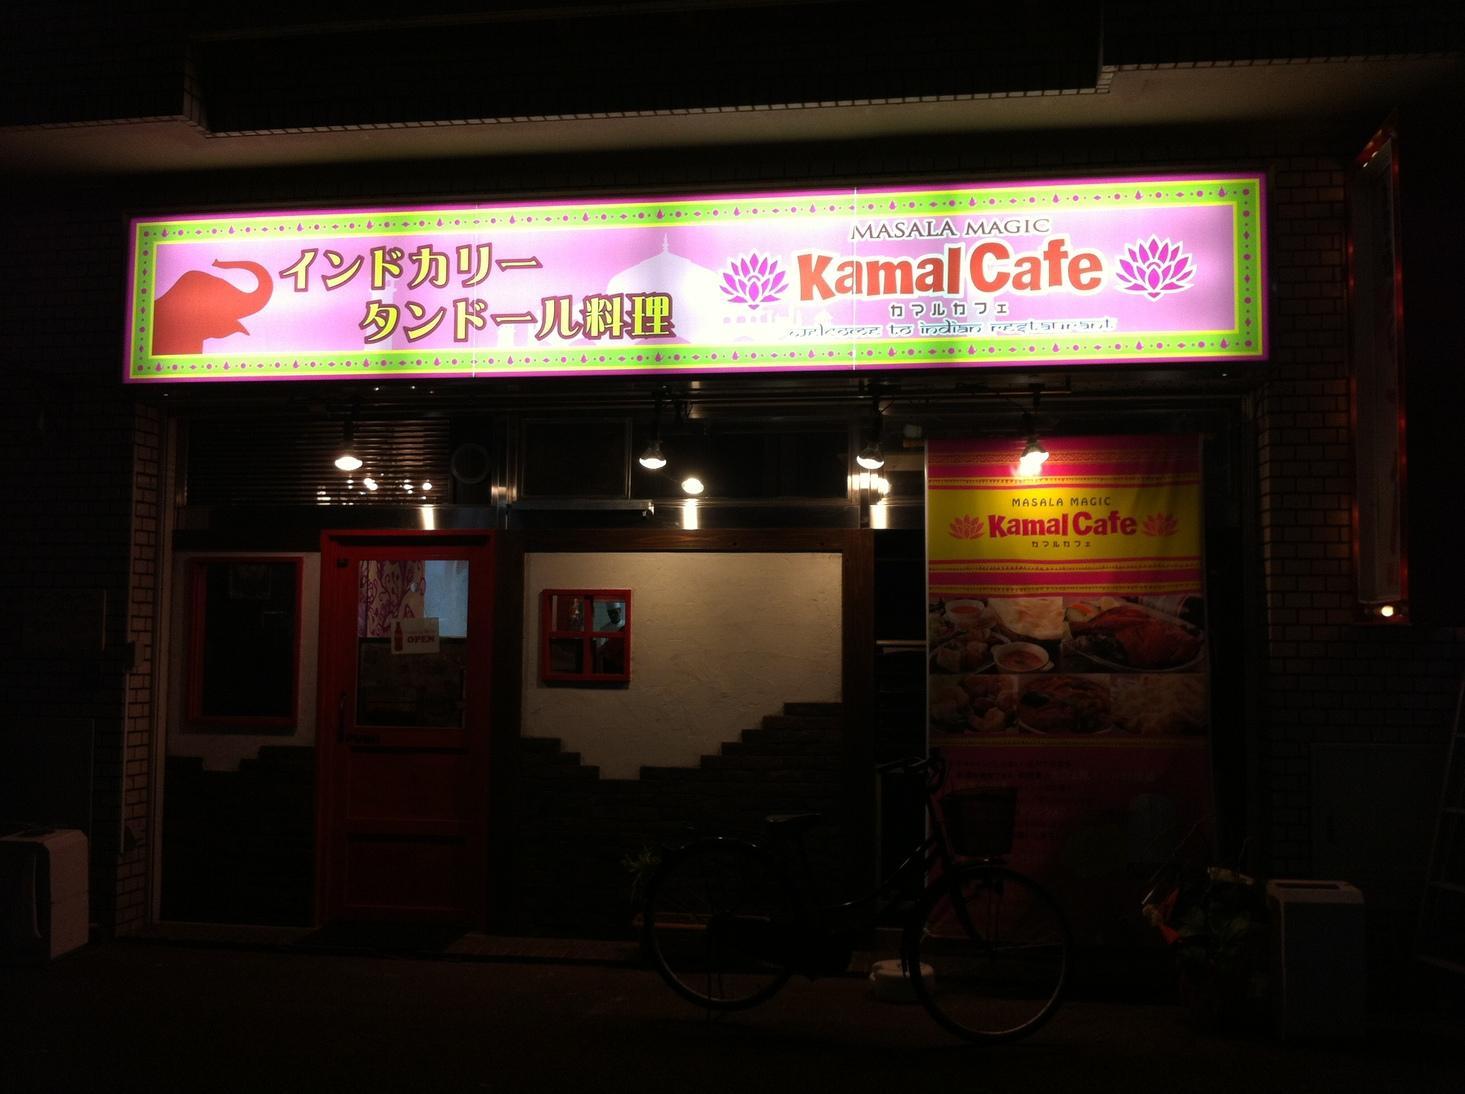 Kamal Cafe 横川駅裏店